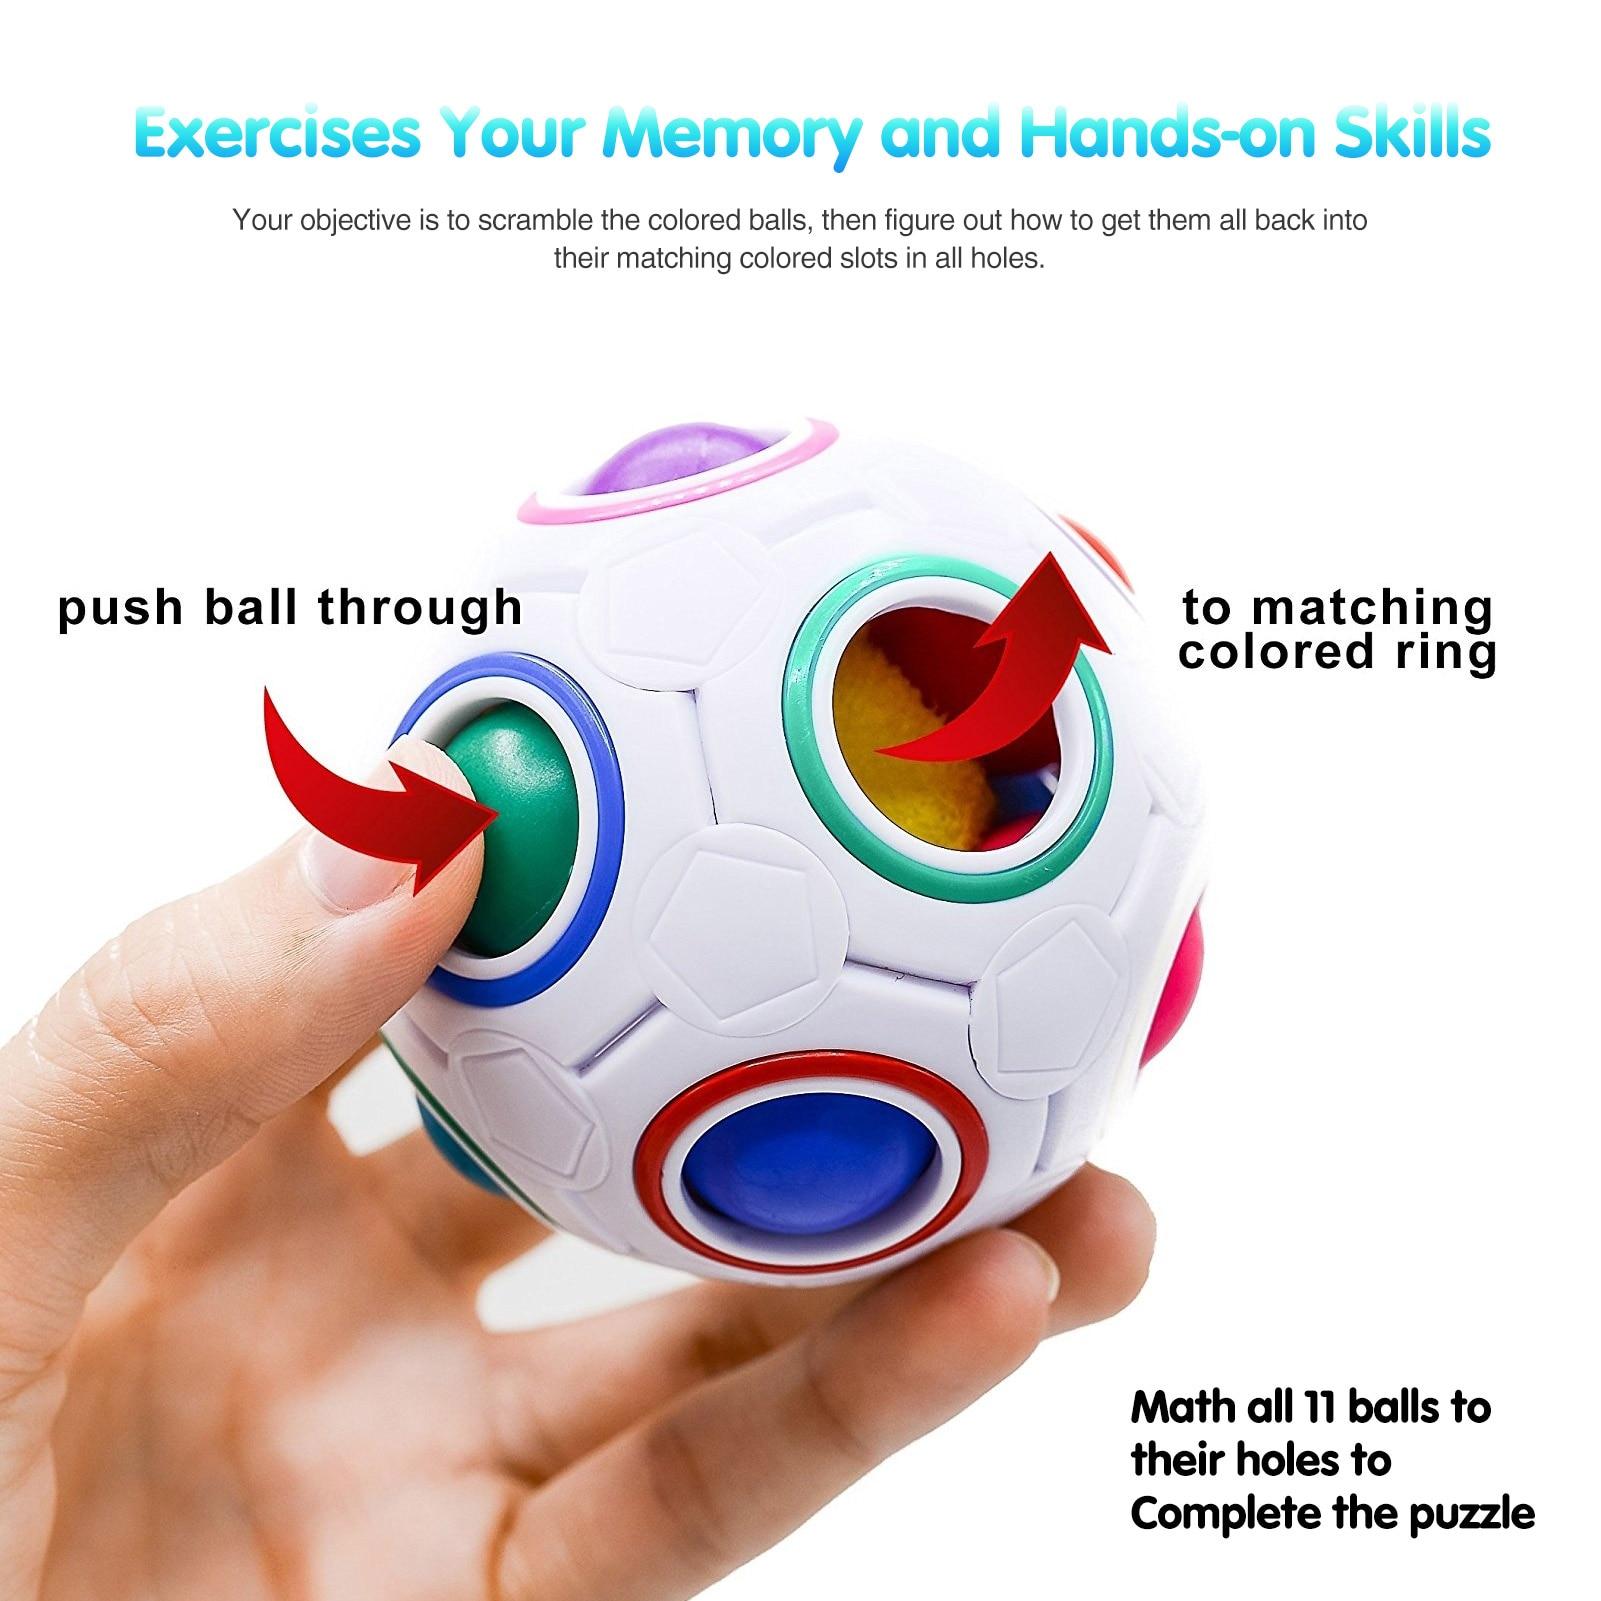 23PCS Sensory Toy Set Durable Decompression Sress Reliver Toy Colorful Simple Dimple Fidget Toy Set Anti-stress For Dult And Kid enlarge